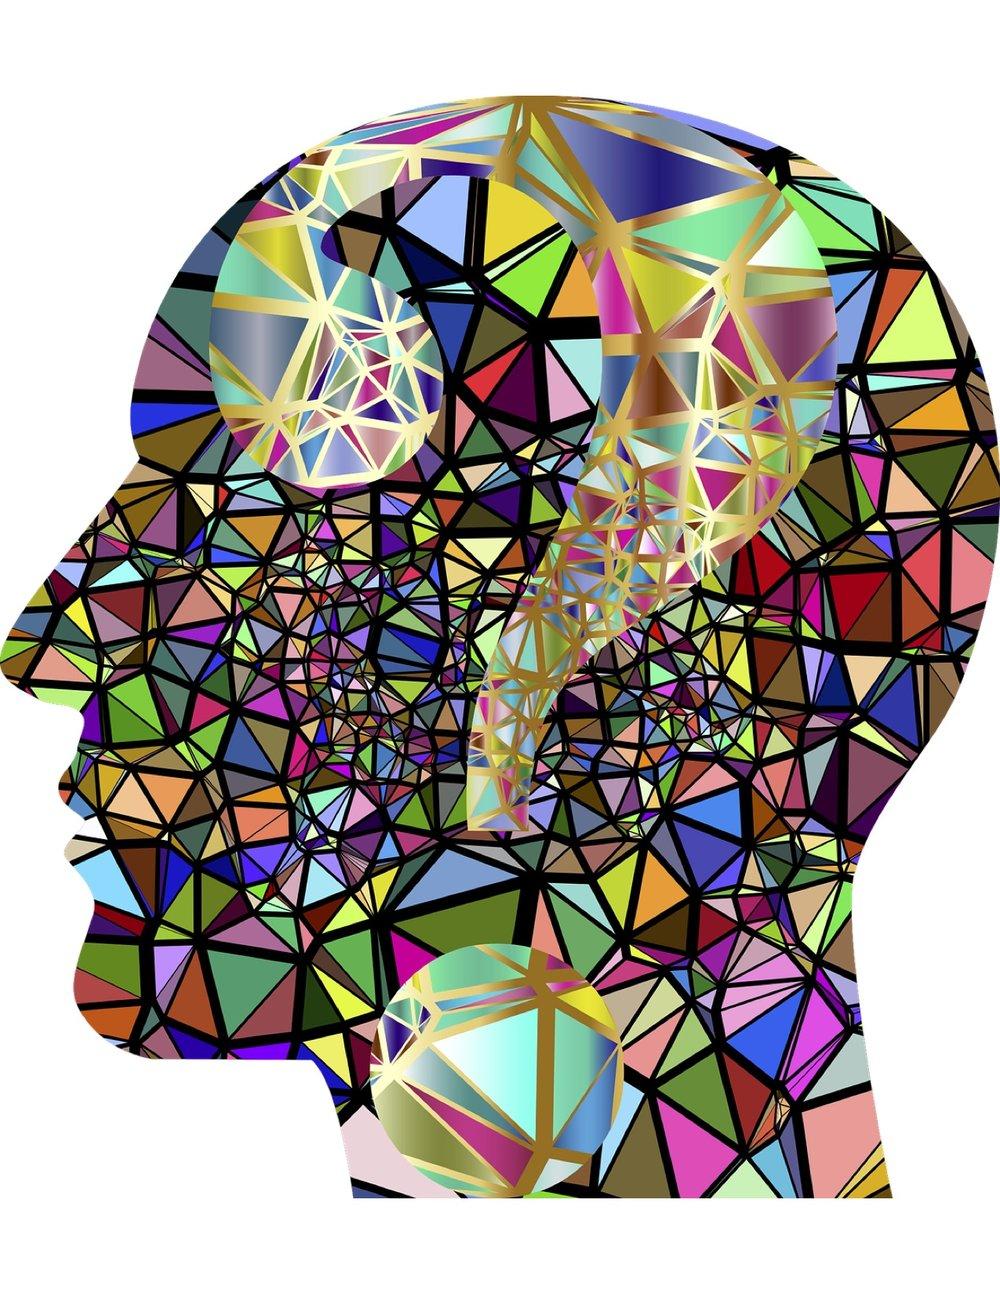 Creative brain pic.jpg